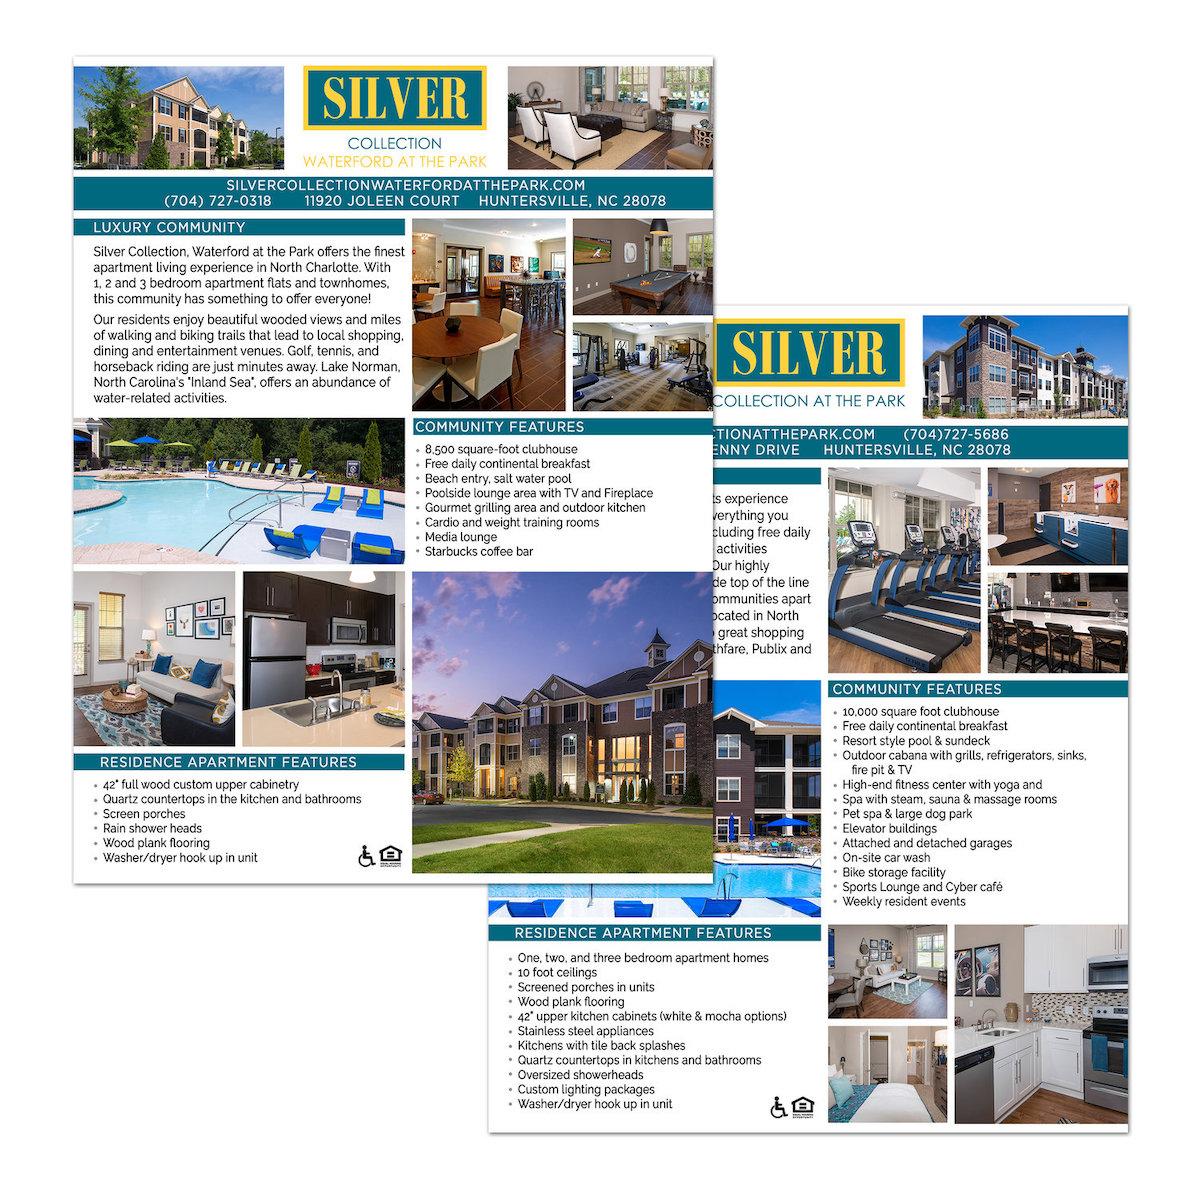 Apartment Complex Flyer Design - Fredericksburg, VA